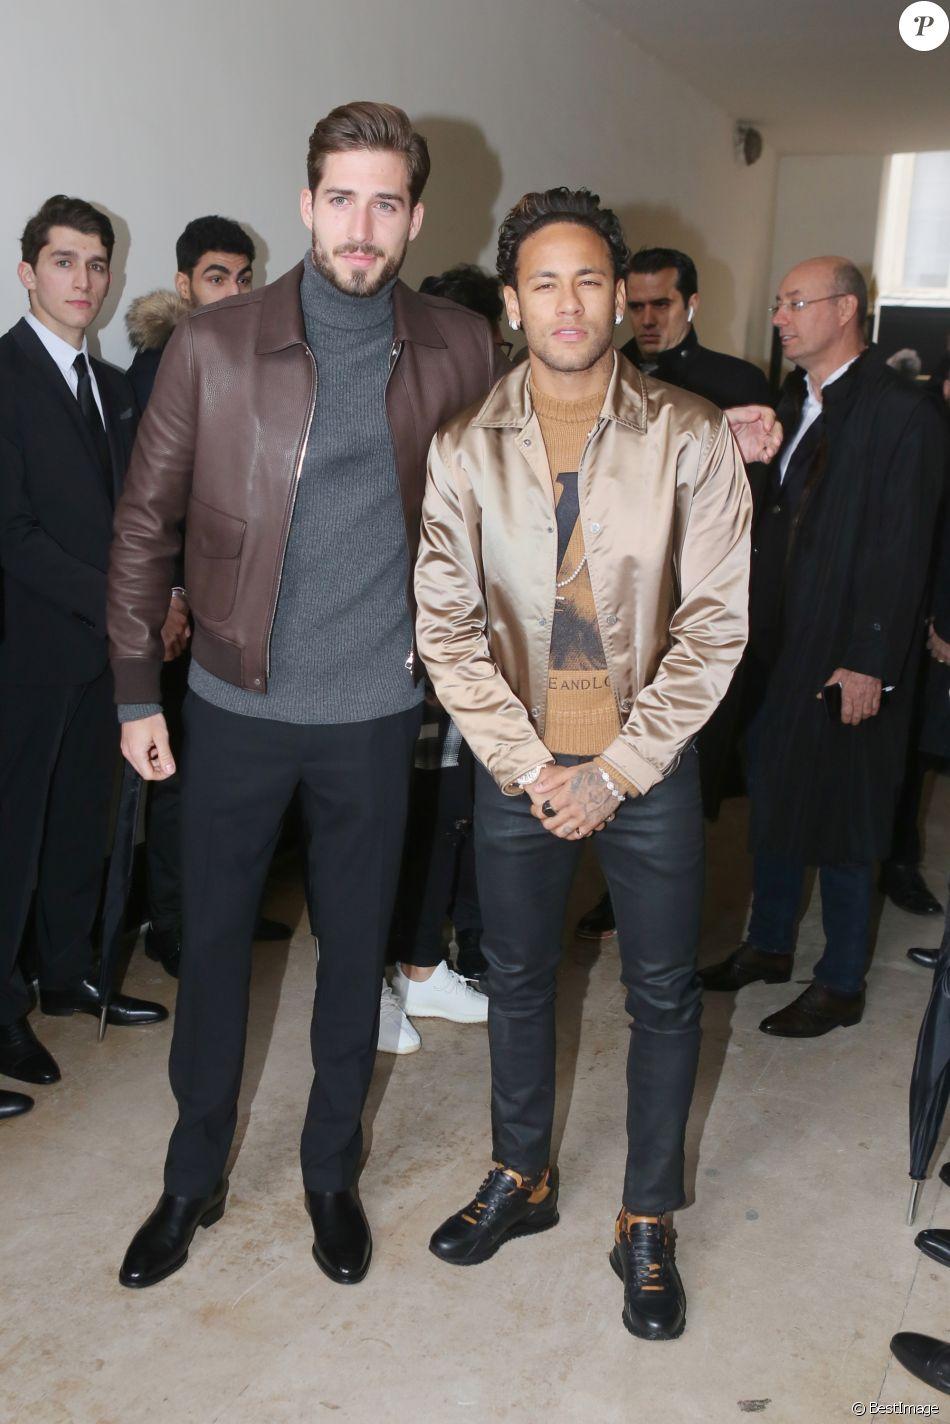 ¿Cuánto mide Neymar? - Altura y peso - Real height 4042984-kevin-trapp-et-neymar-jr-arrivees-au-d-950x0-1